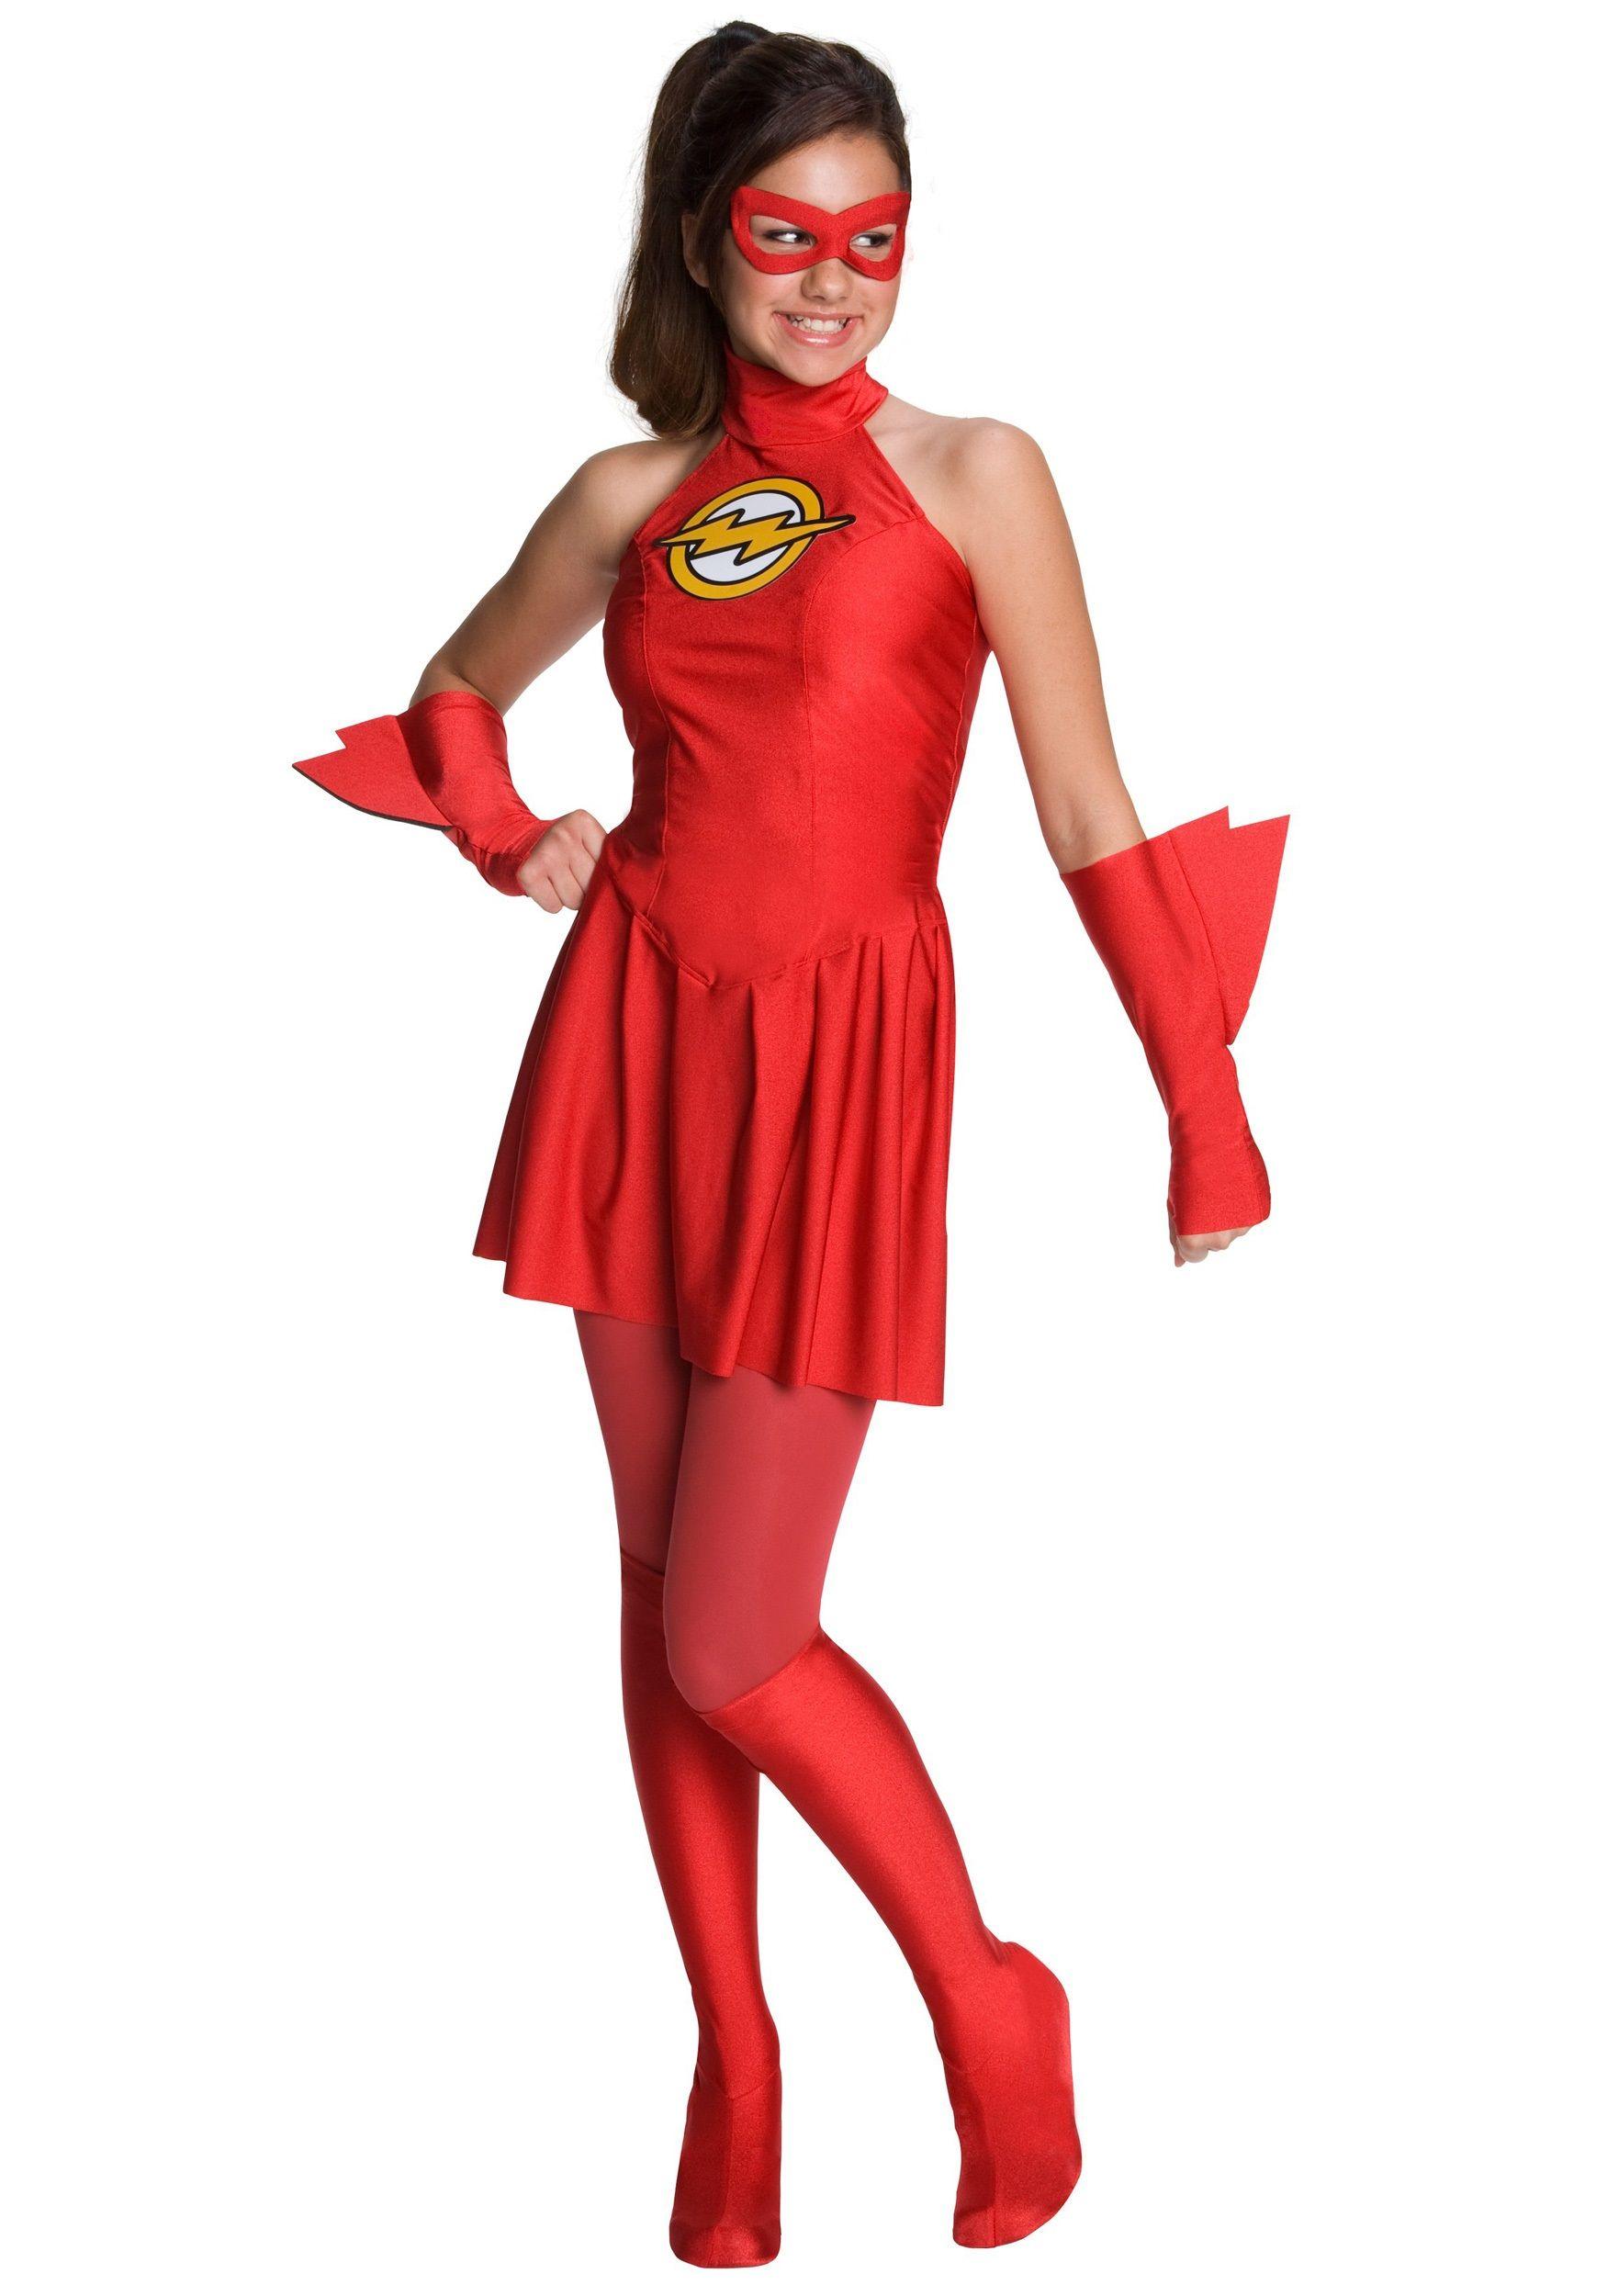 female superhero costumes for kids | ... Costume Ideas Superhero ...